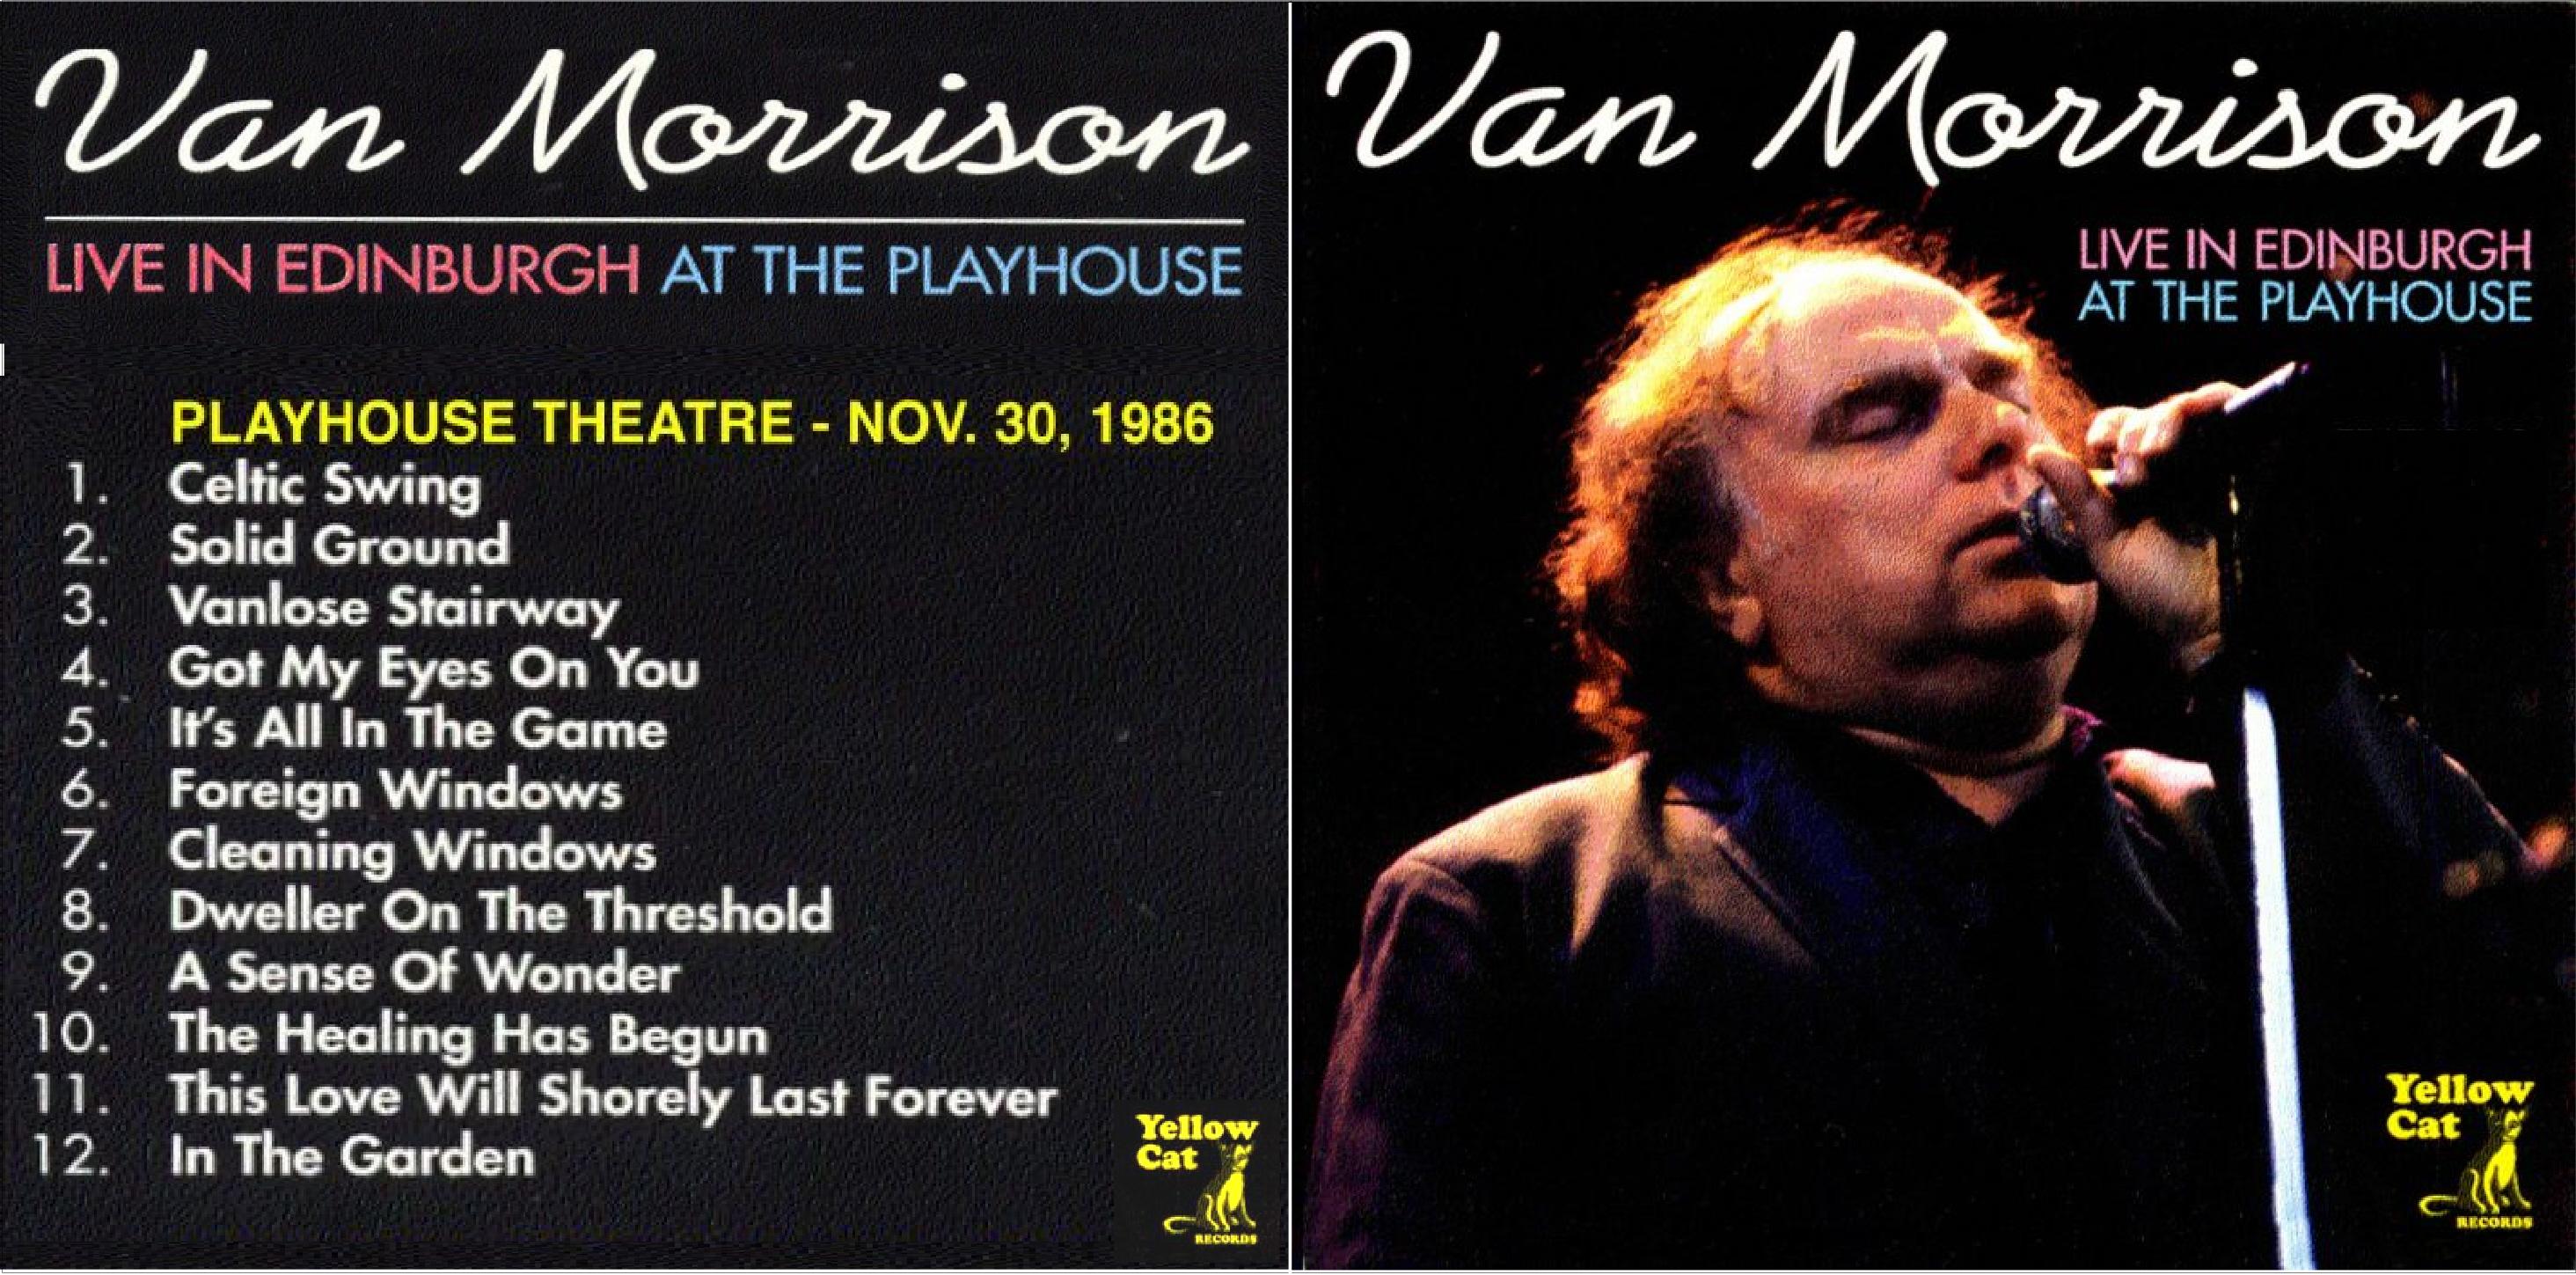 VanMorrison1986-11-30ThePlayhouseEdinburghScotland.jpg